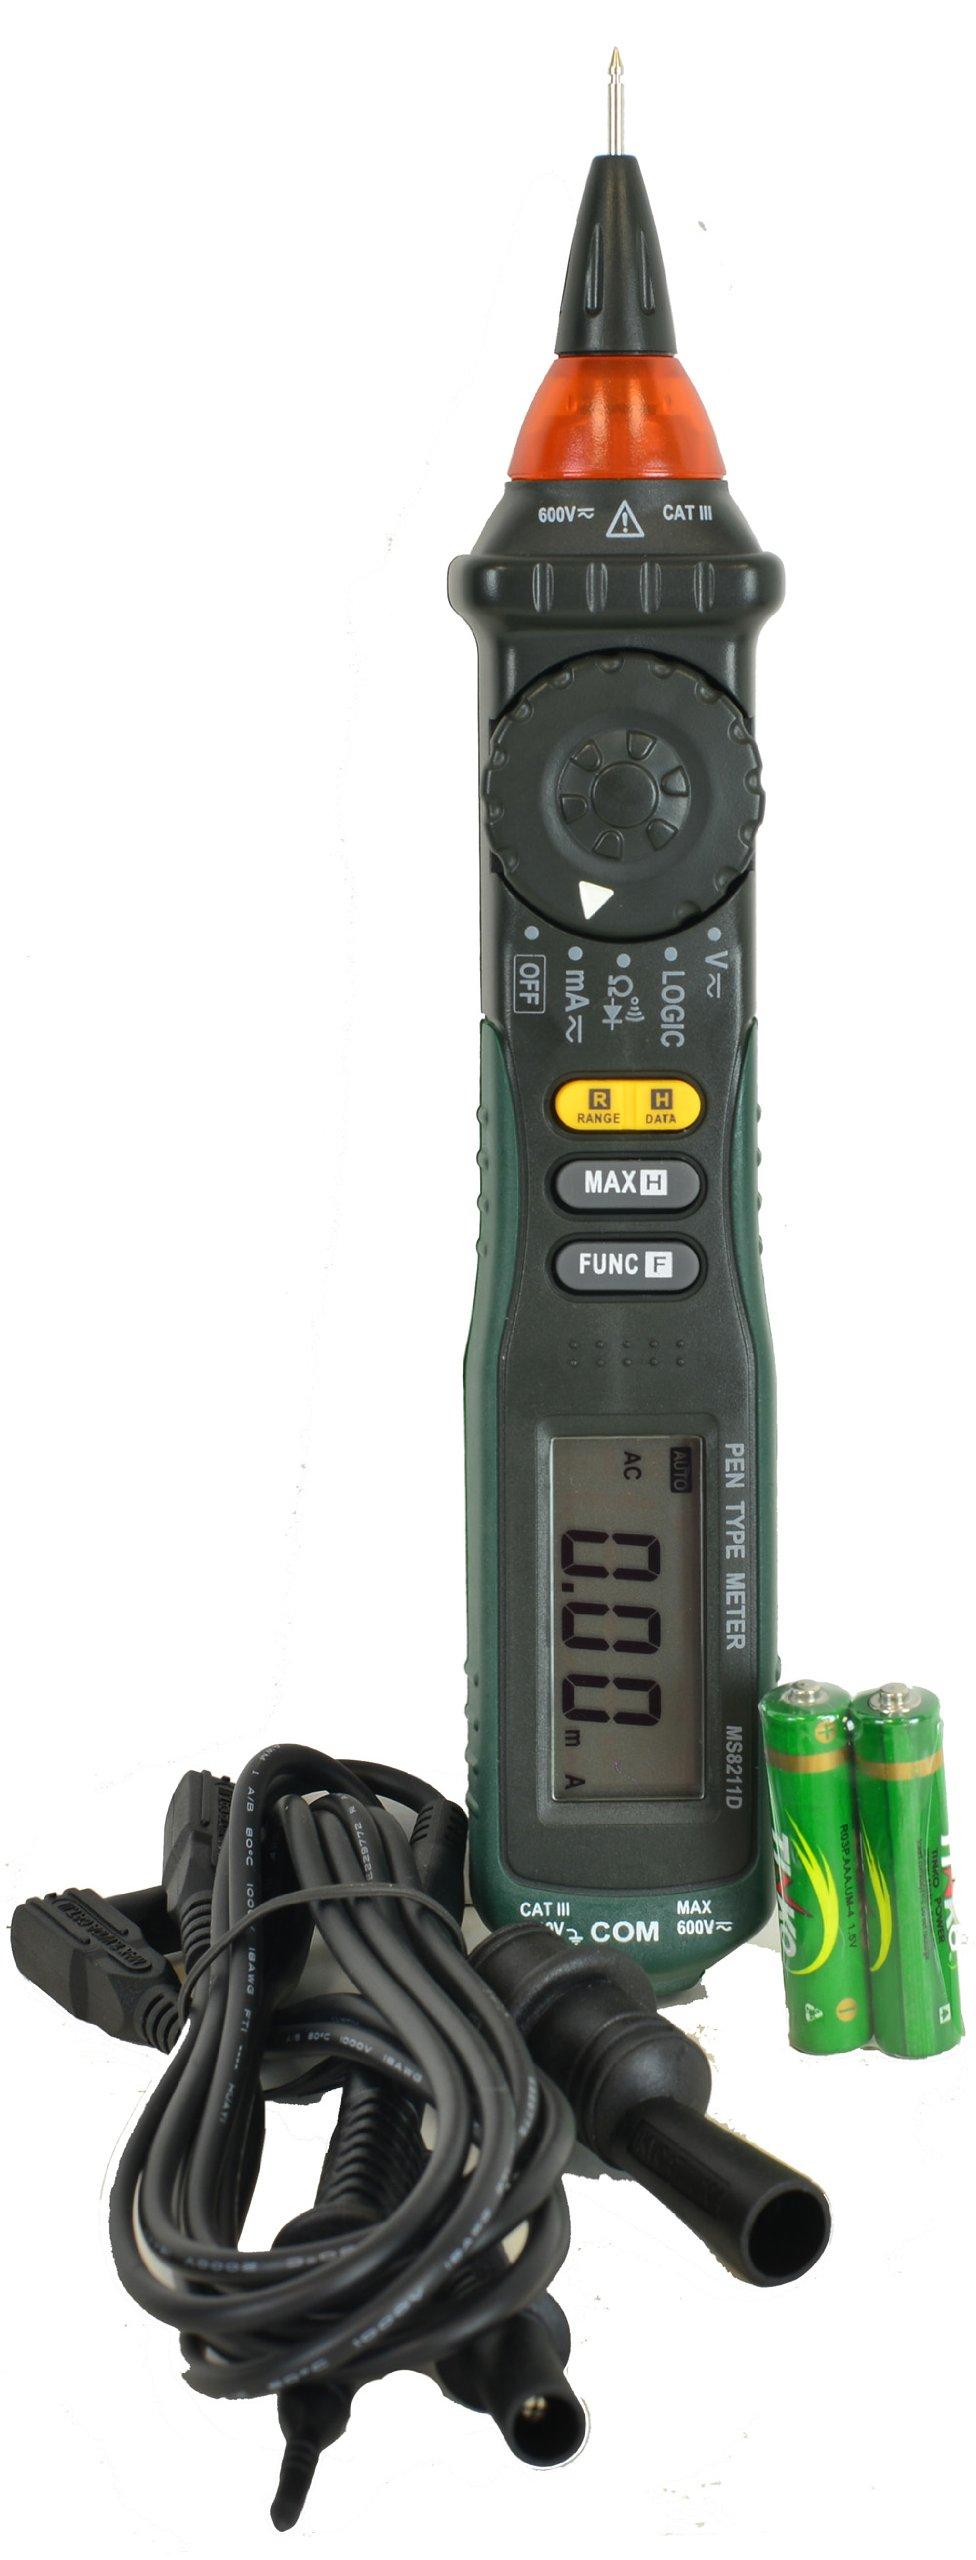 Tekpower MS8211D Auto Range Pen Type Digital Multimeter with Logic Test, OEM MS8211D¡